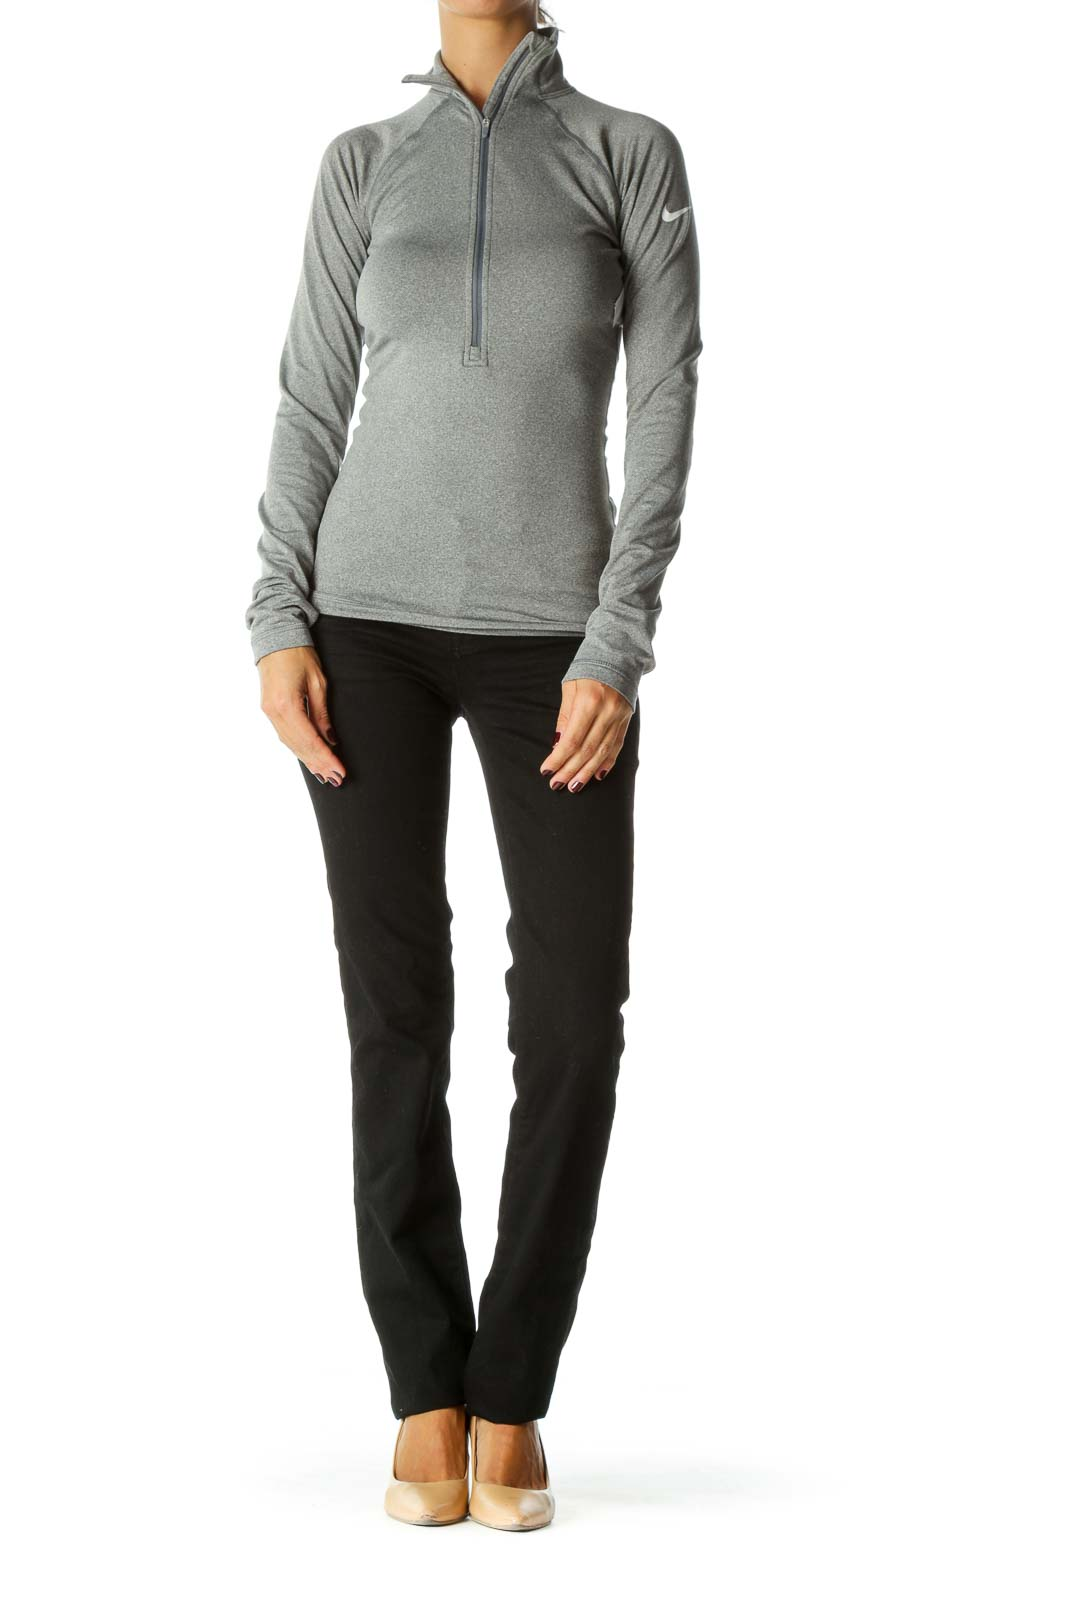 Gray Long Sleeve Zippered Sports Jacket